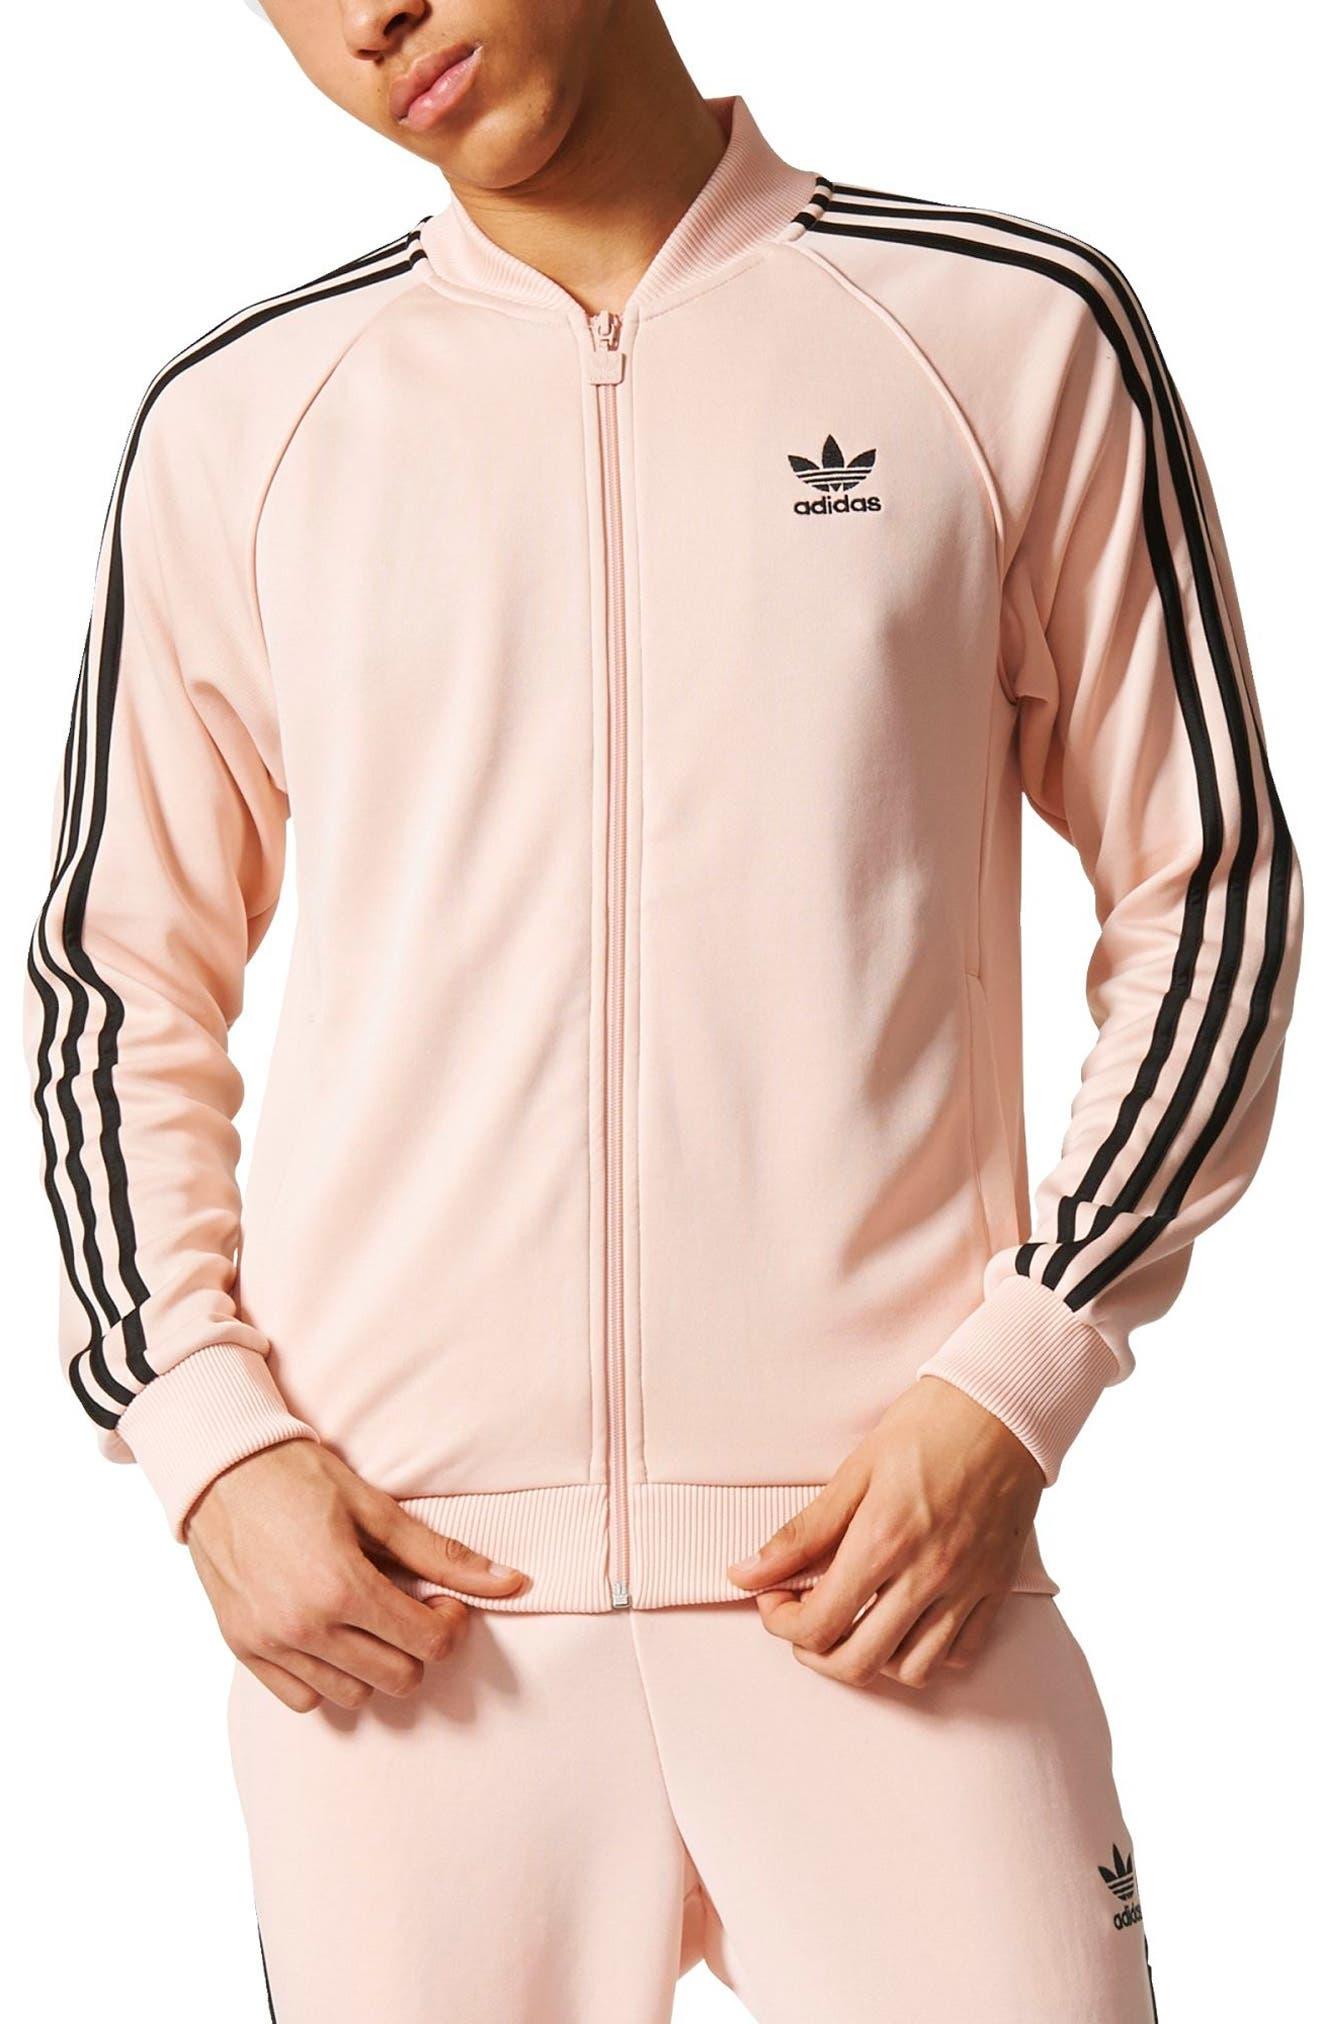 Alternate Image 1 Selected - adidas Originals 'Superstar' Track Jacket